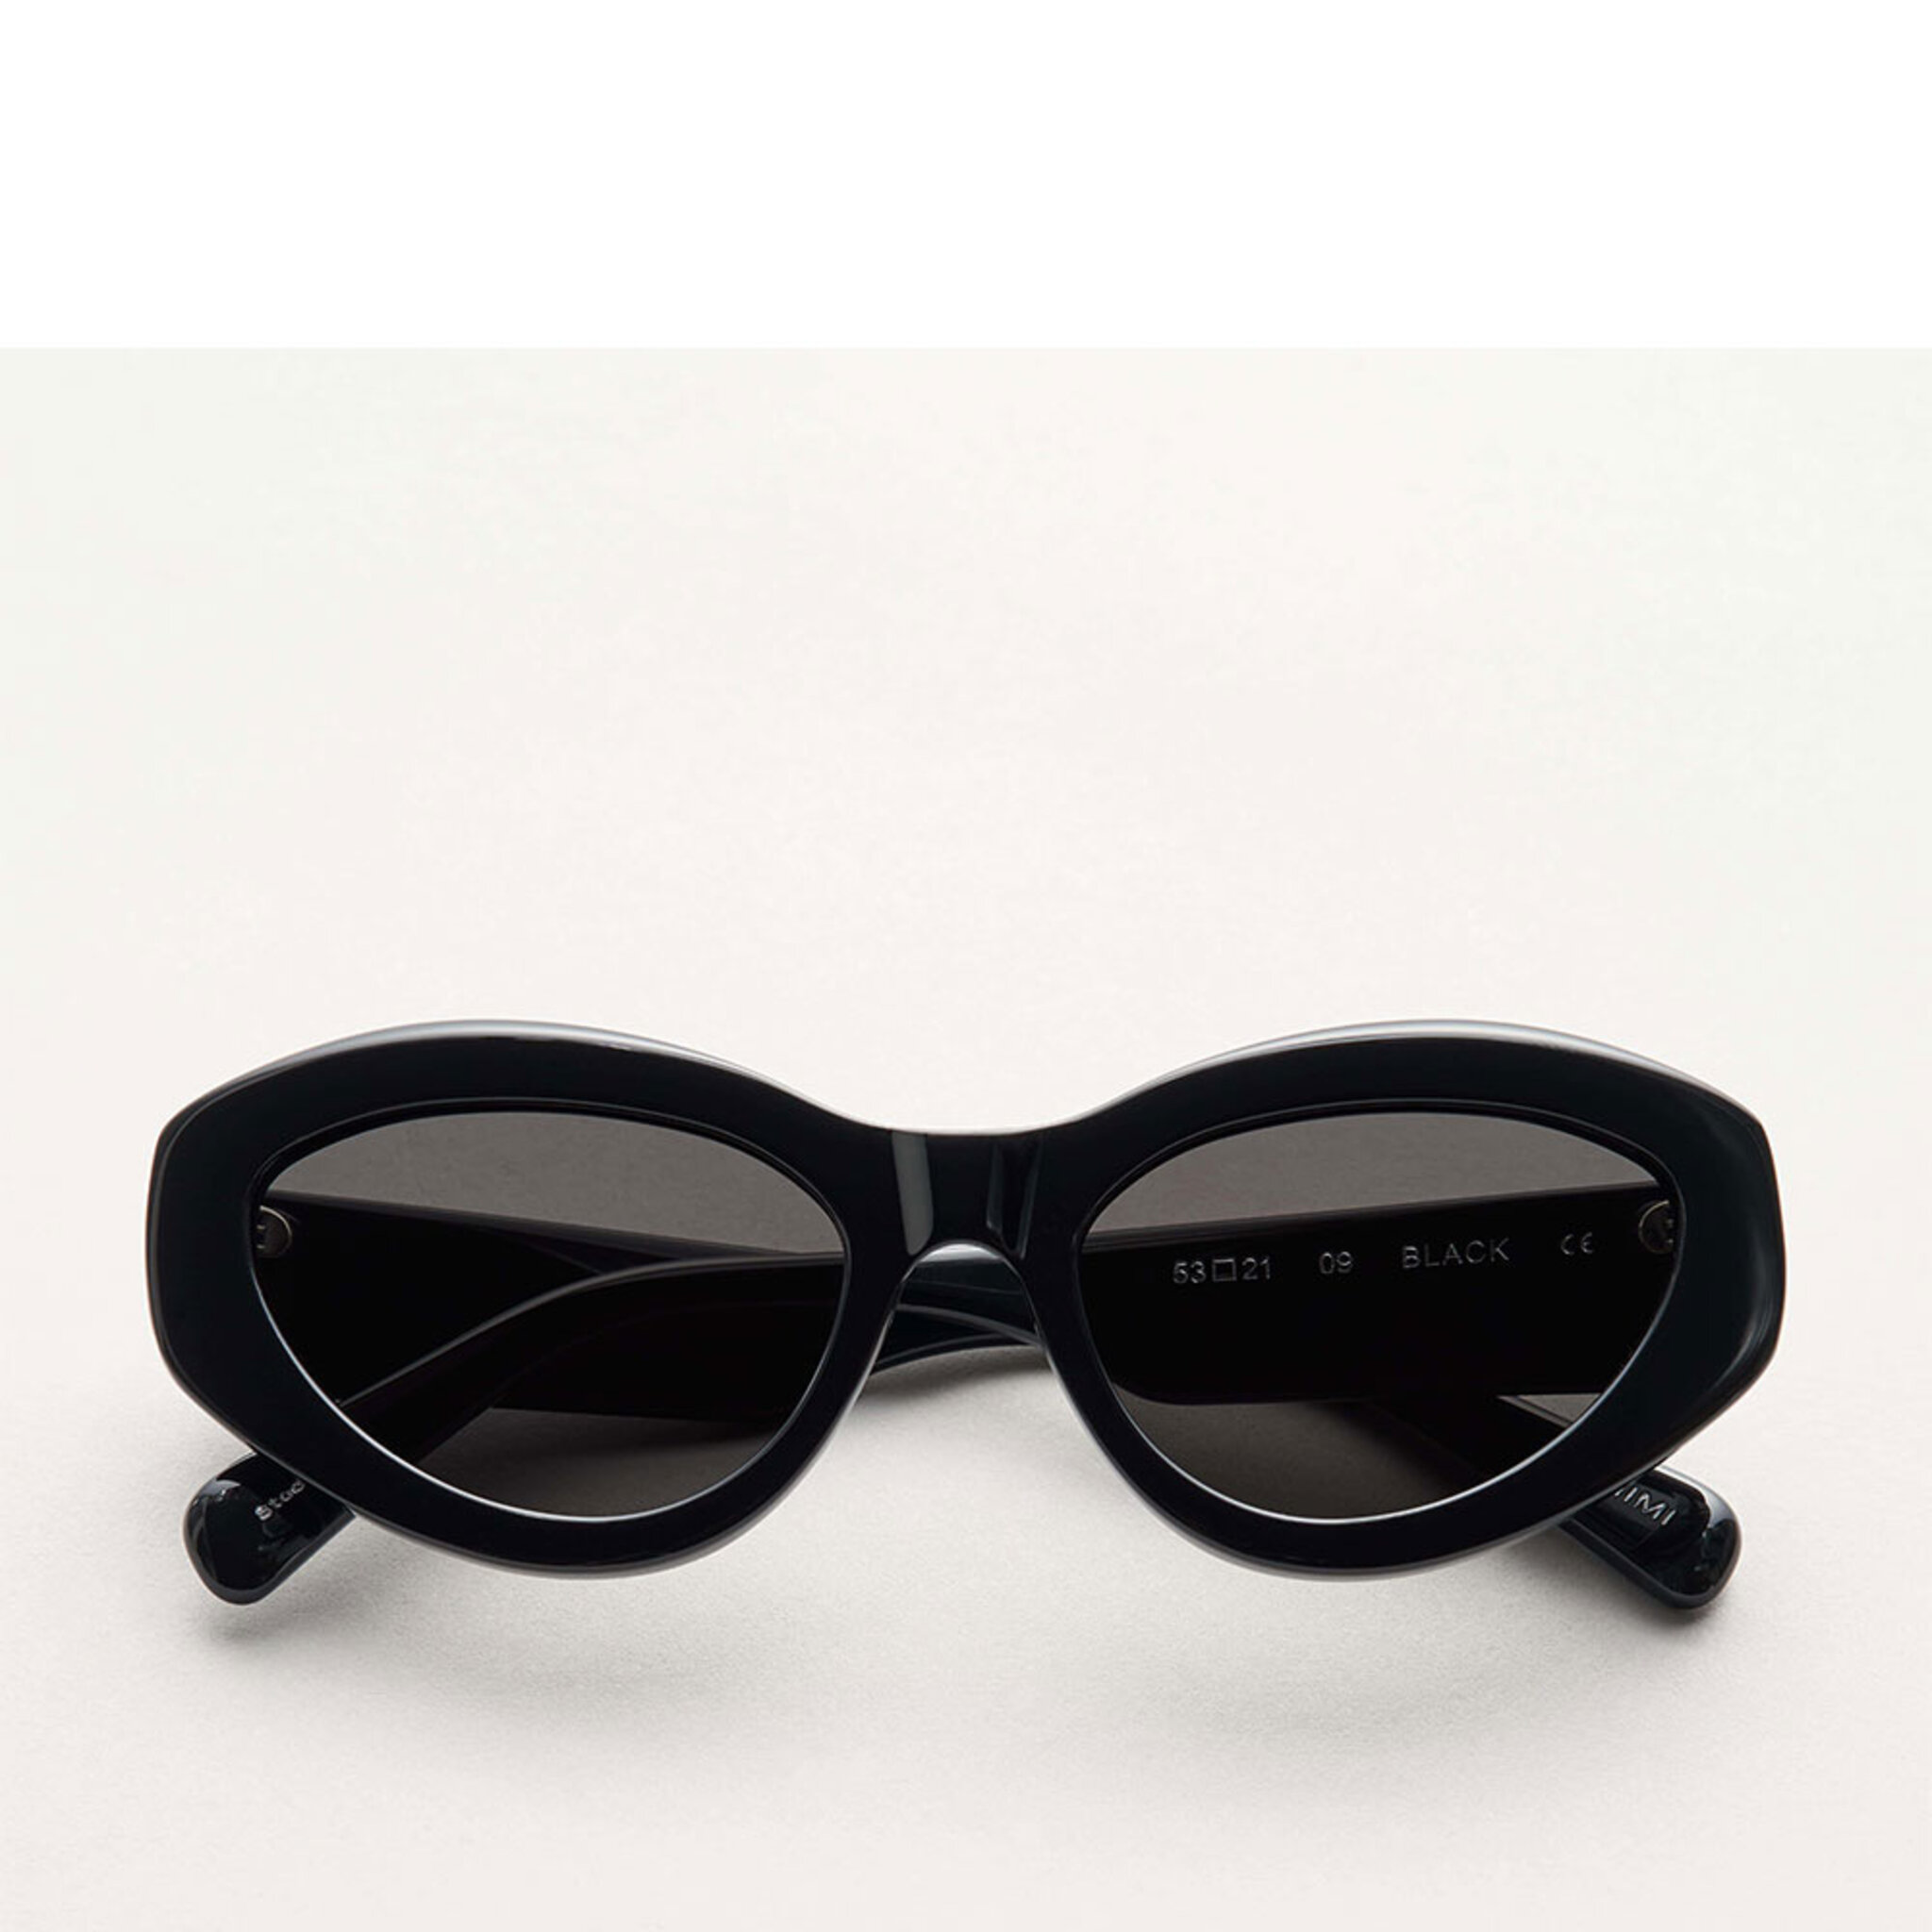 Chimi Eyewear sunglasses 09